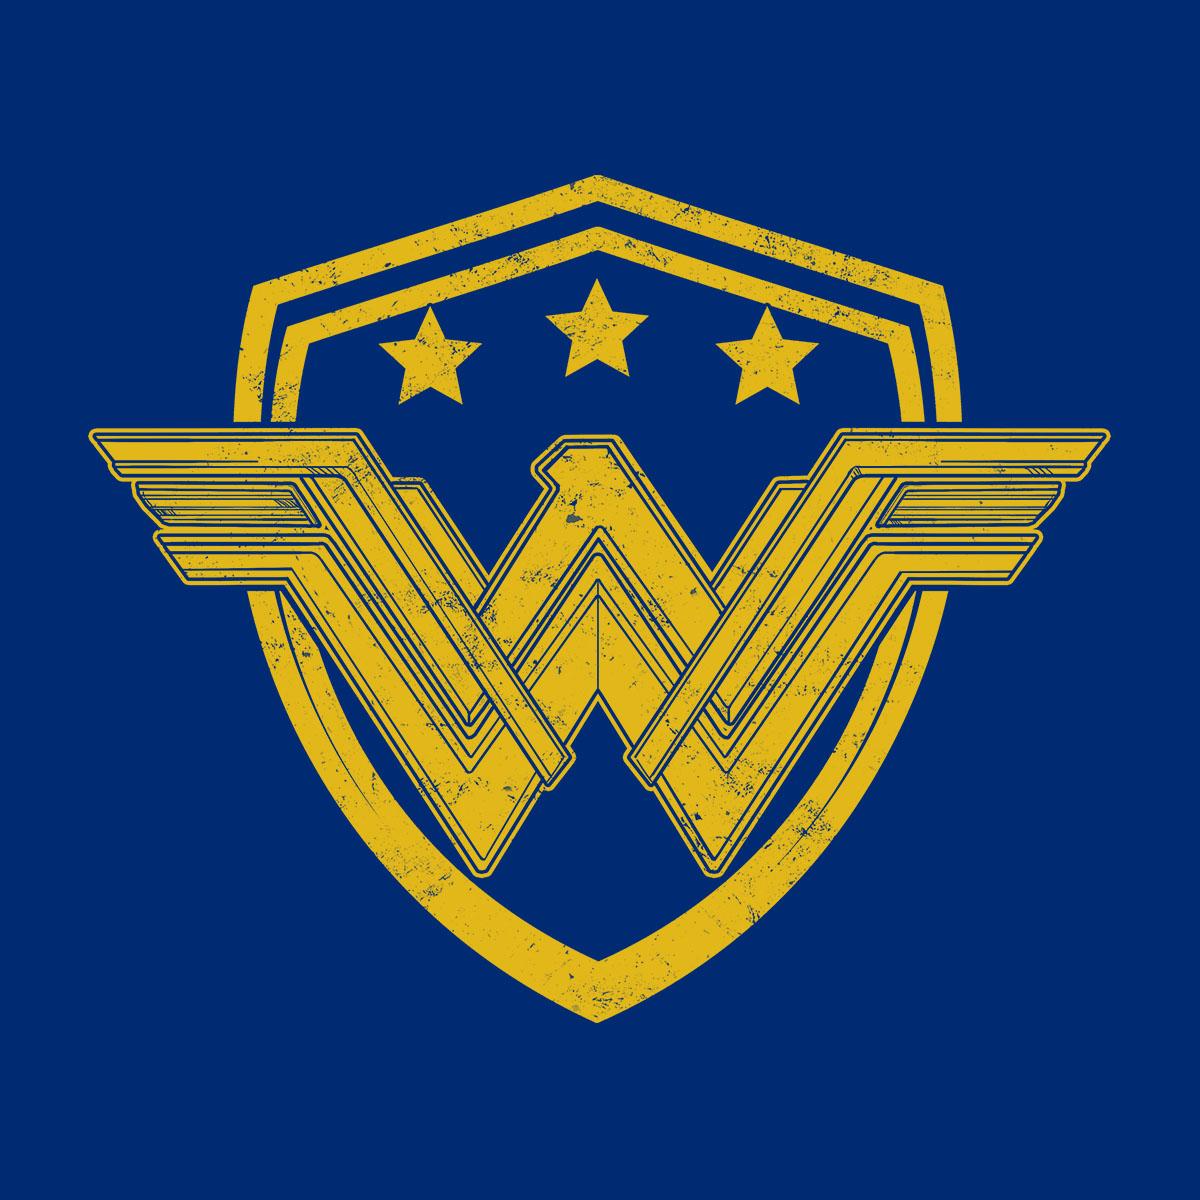 wonder woman symbol 71379 investingbb